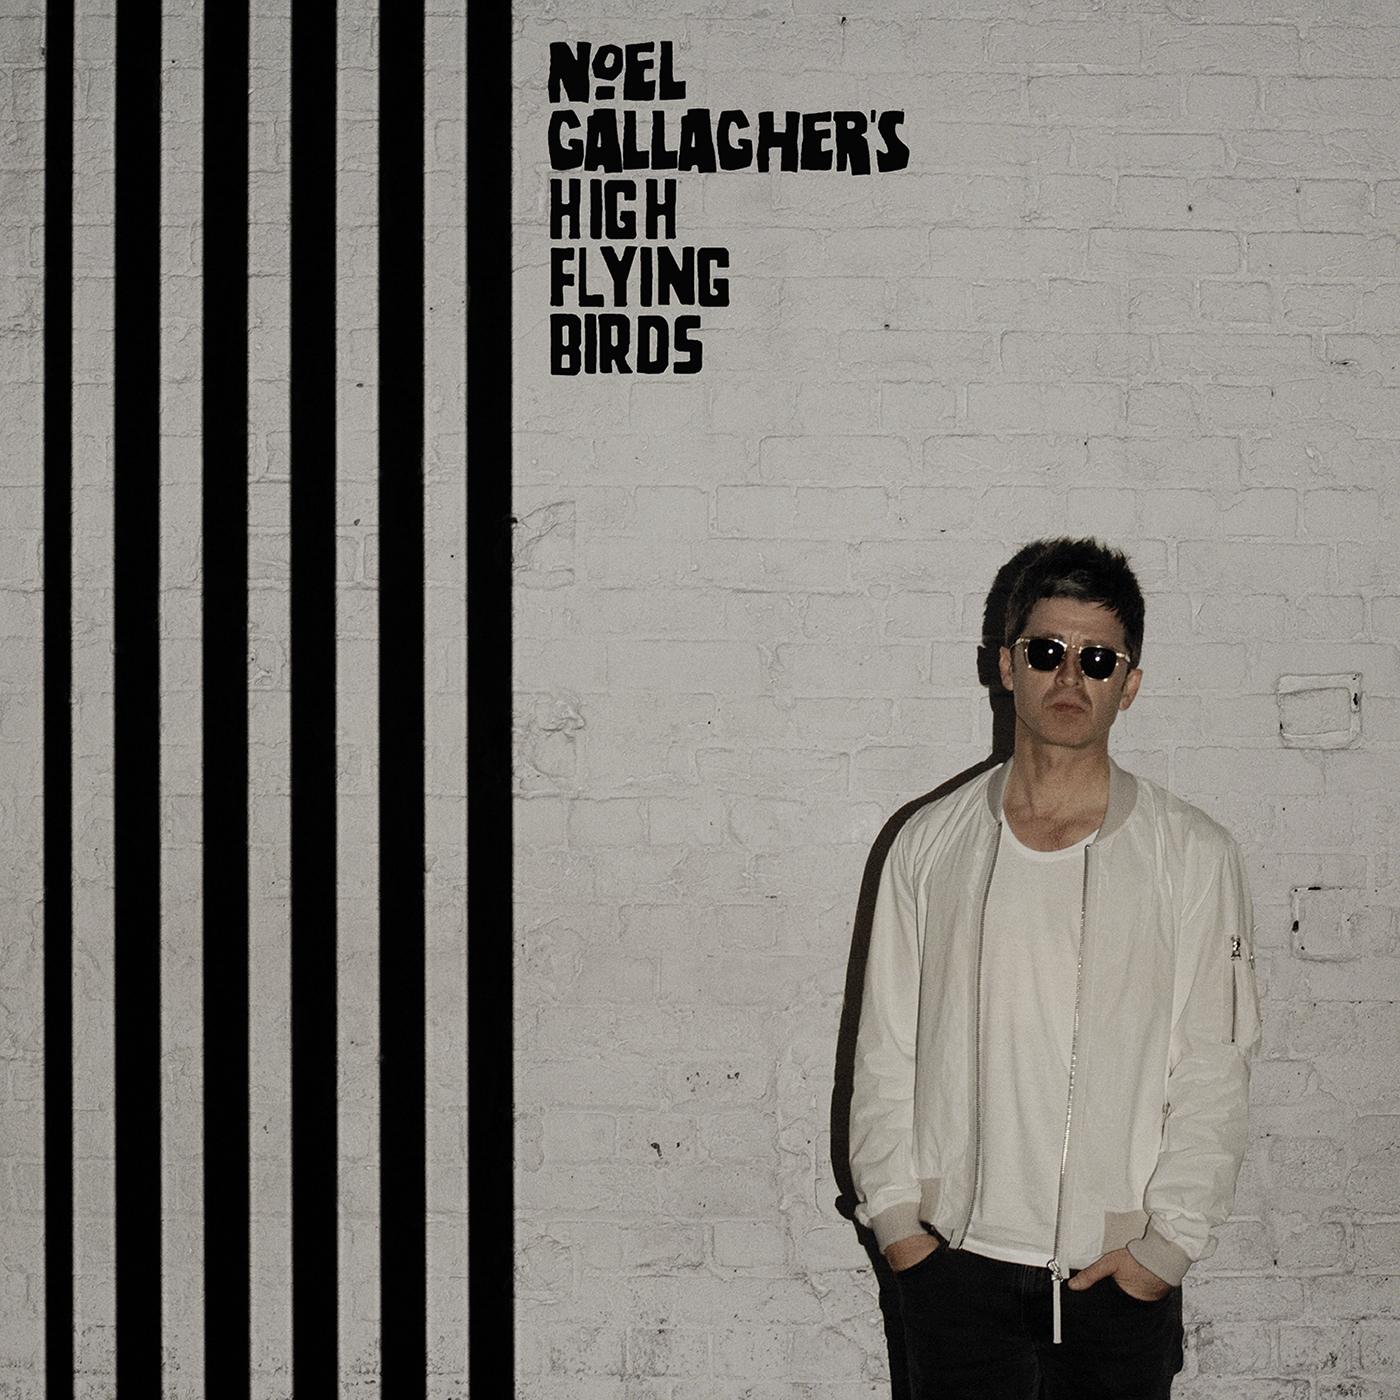 Noel_Gallaghers_High_Flying_Birds_album_artwork